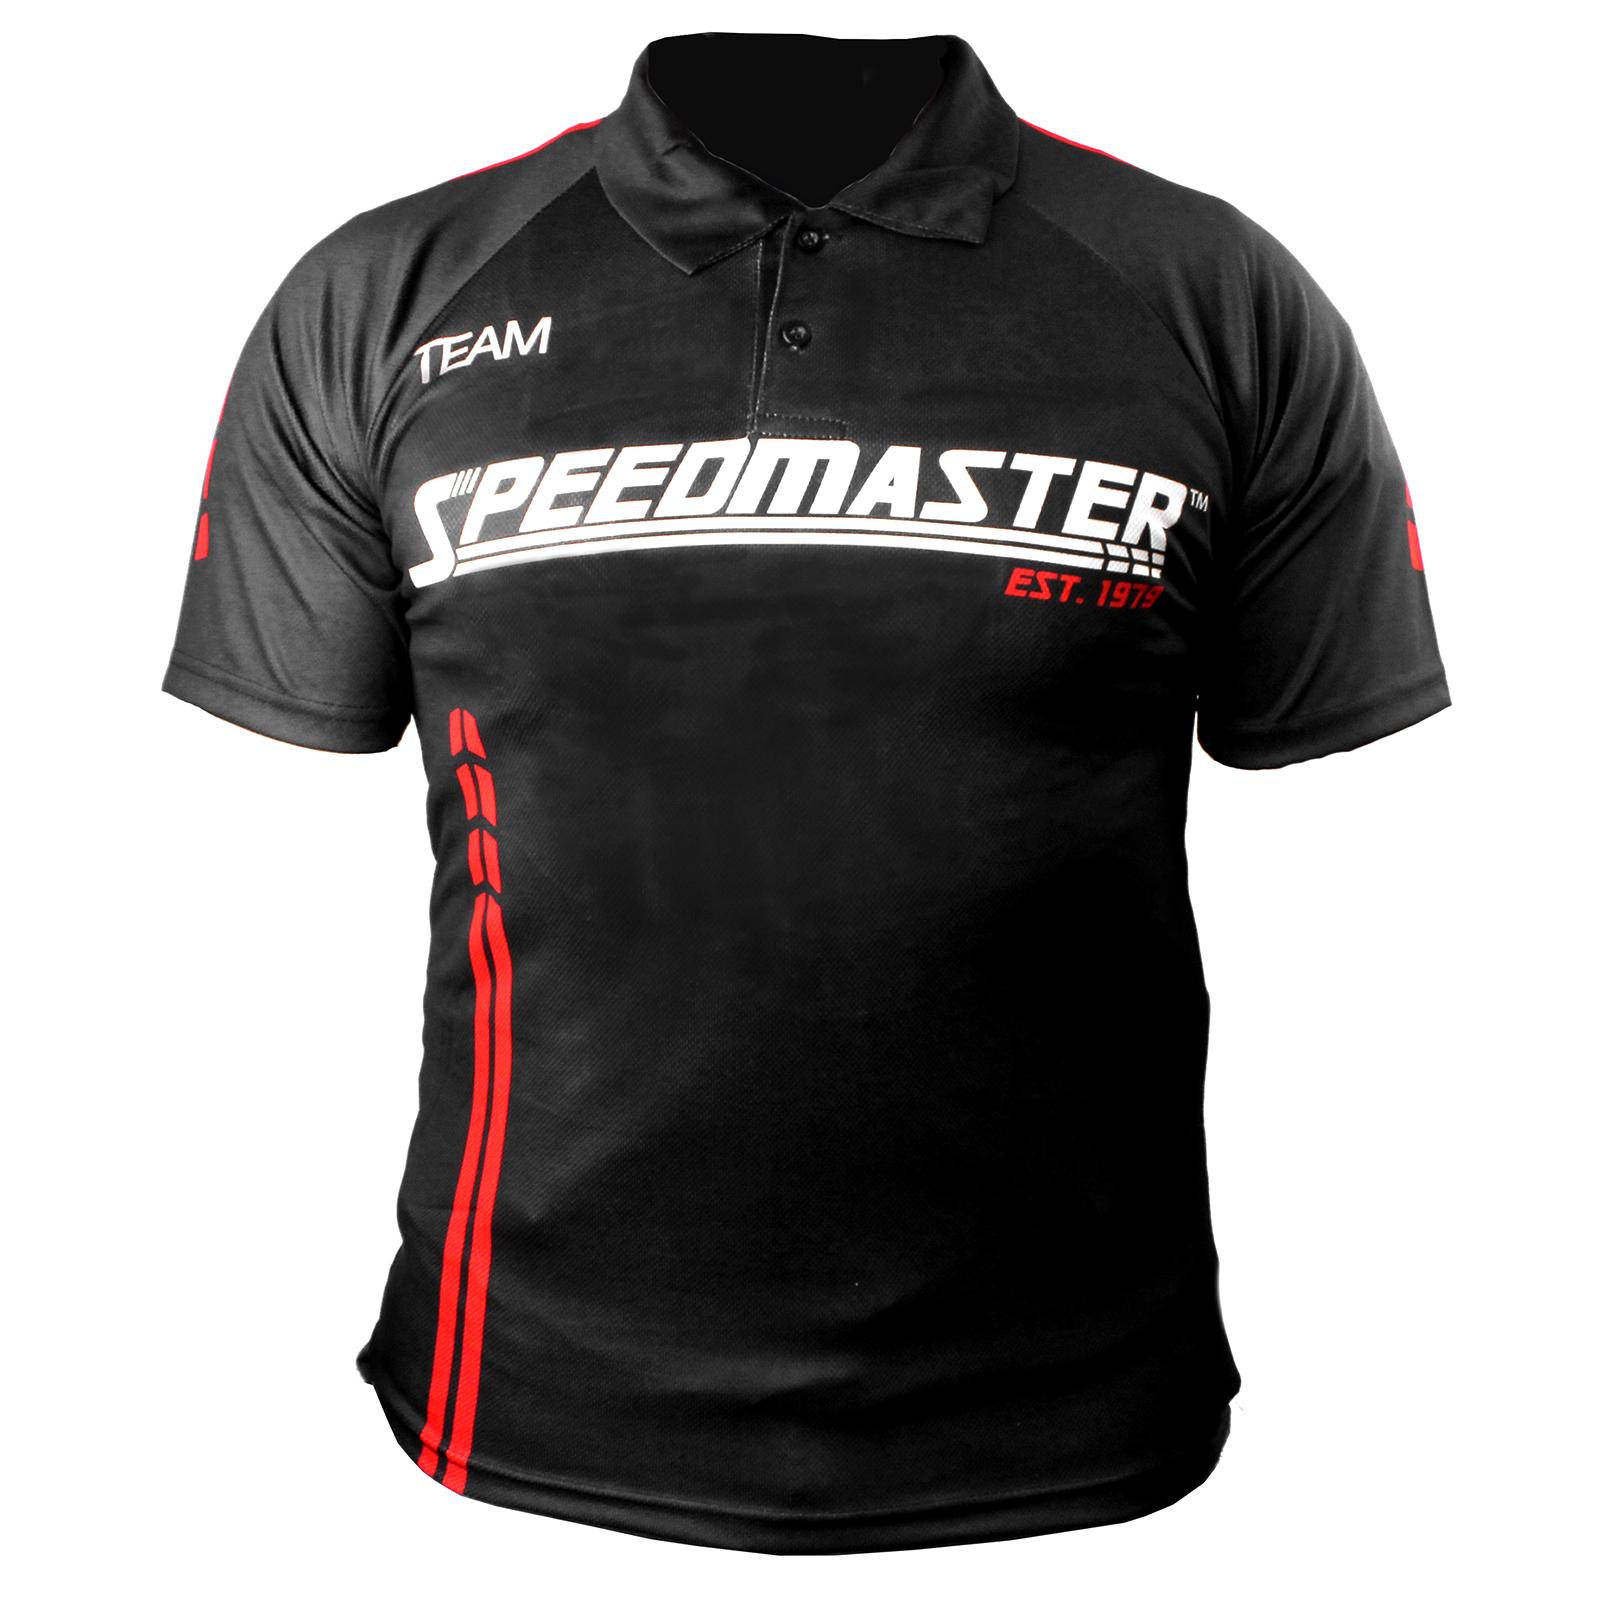 Speedmaster Team Jersey / Polo Shirt - Medium M